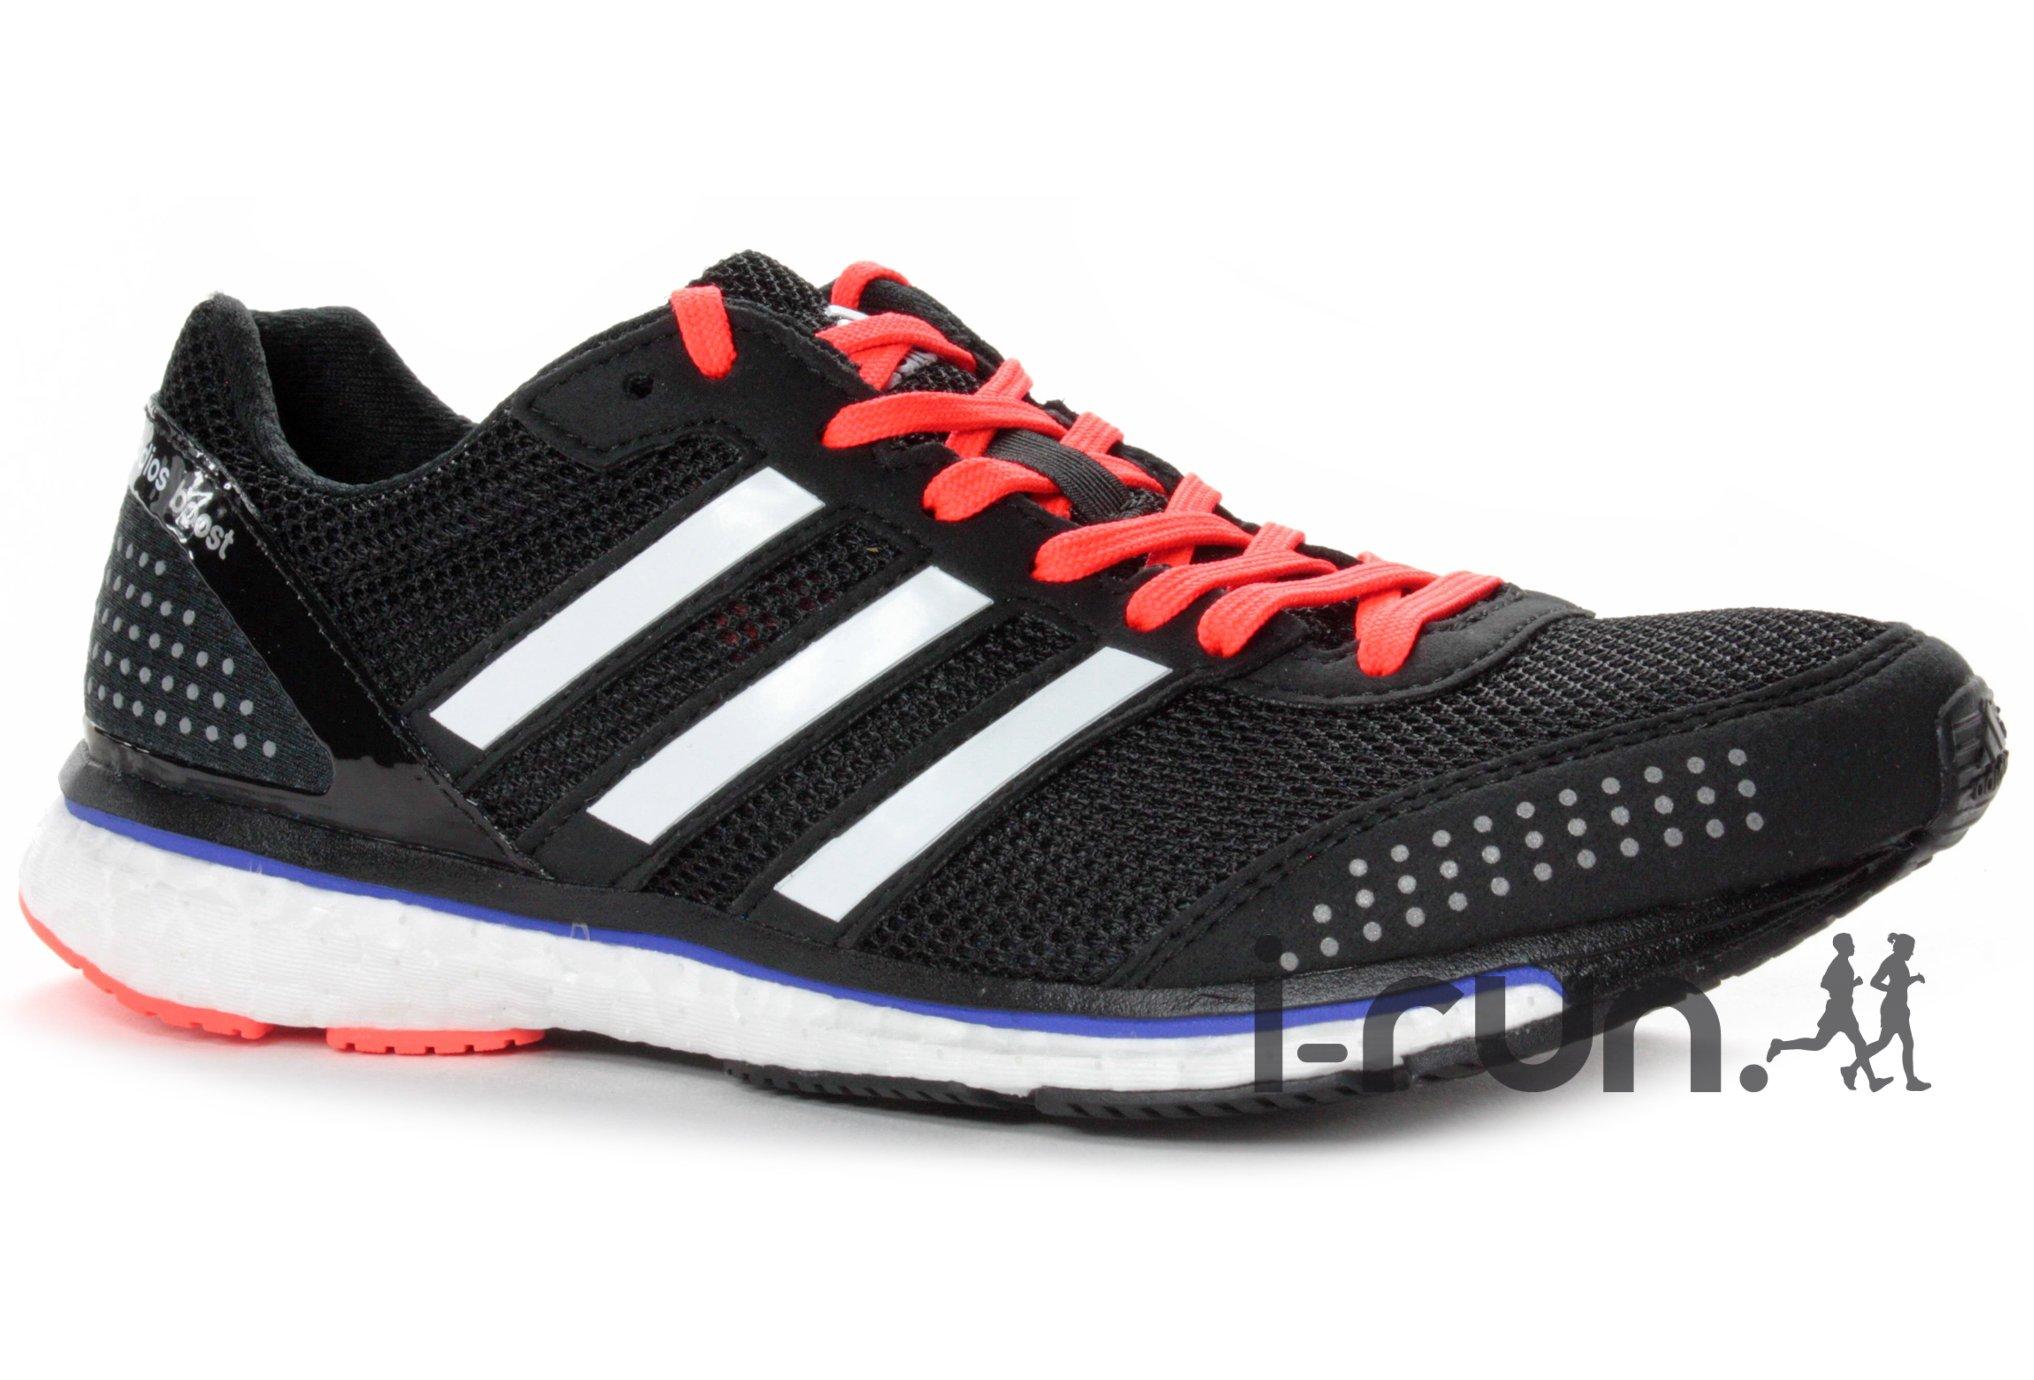 Adidas Adizero adios boost 2 w diététique chaussures femme